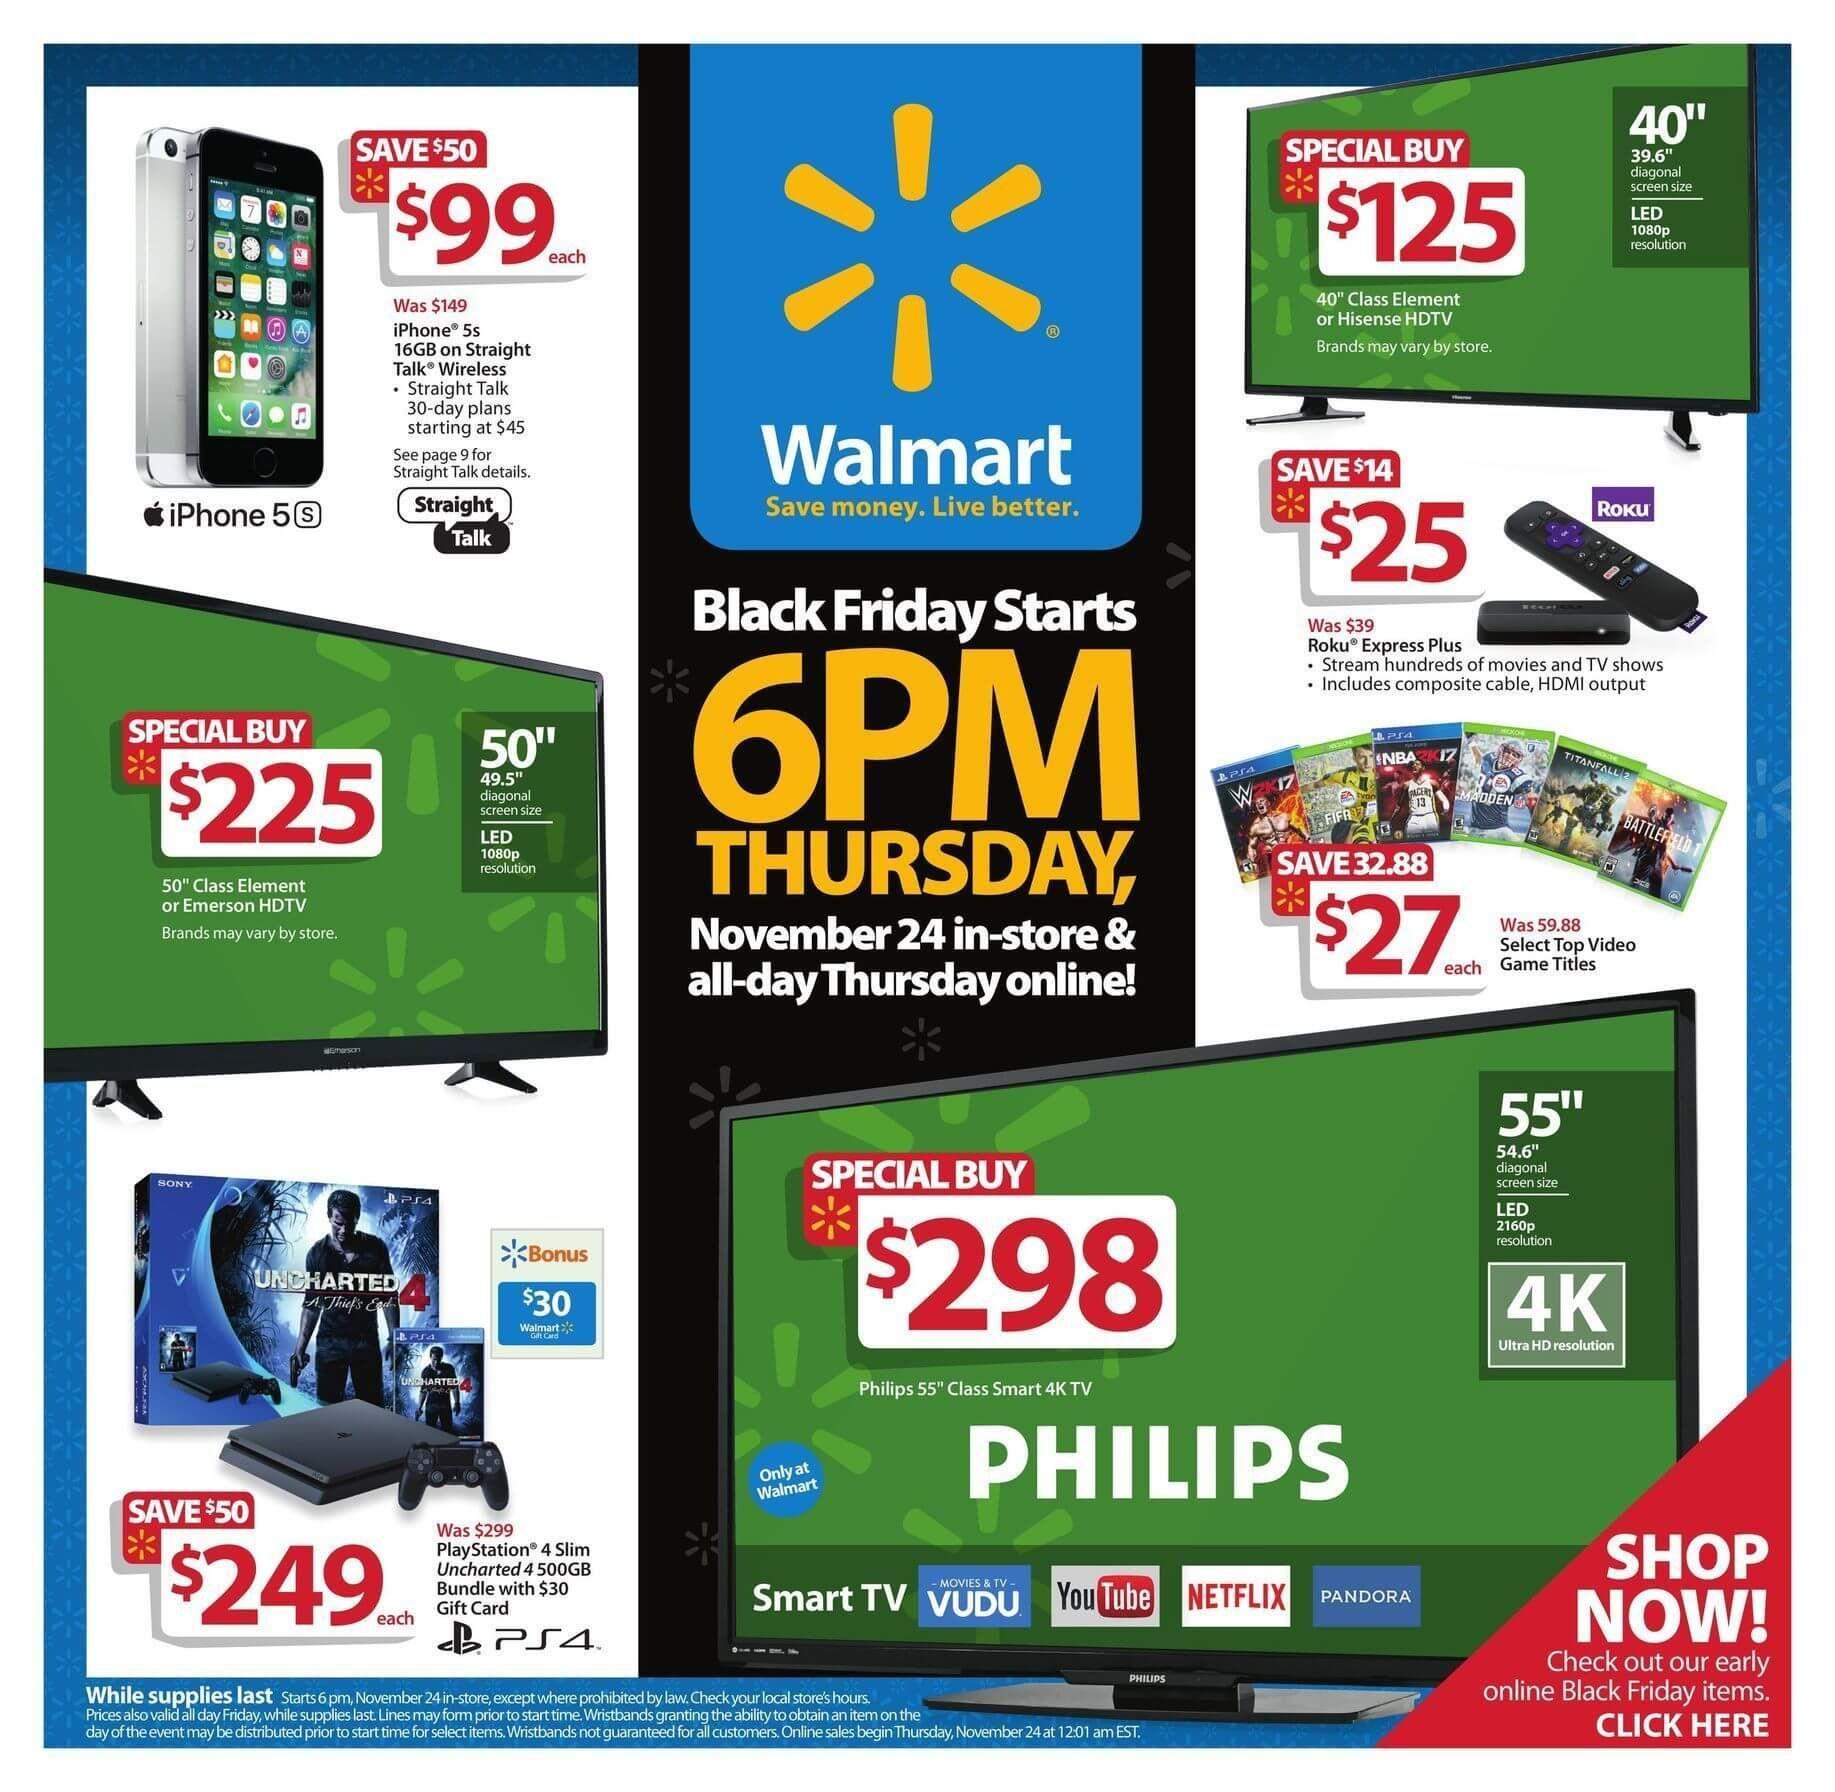 Walmart Black Friday 2016 Ad Page 1 Walmart Black Friday Ad Black Friday Walmart Black Friday